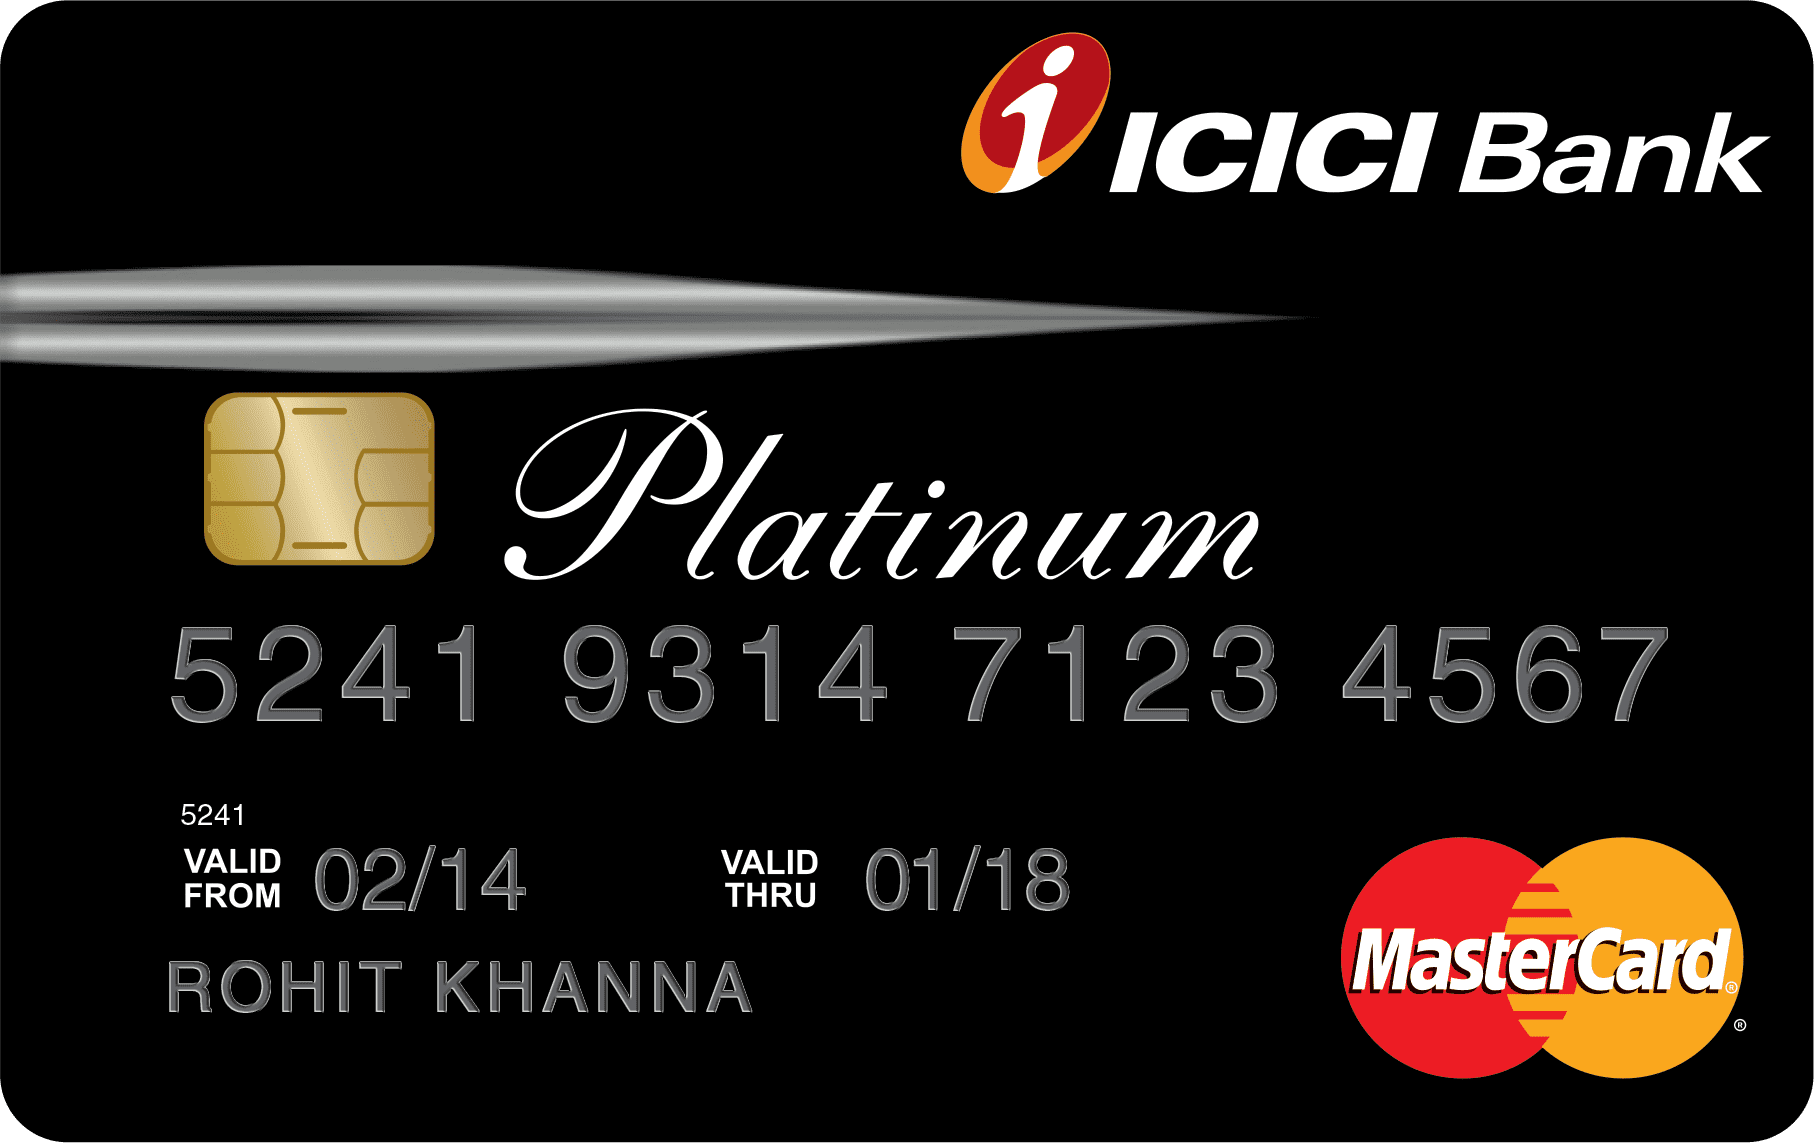 ICICI Bank Credit Card